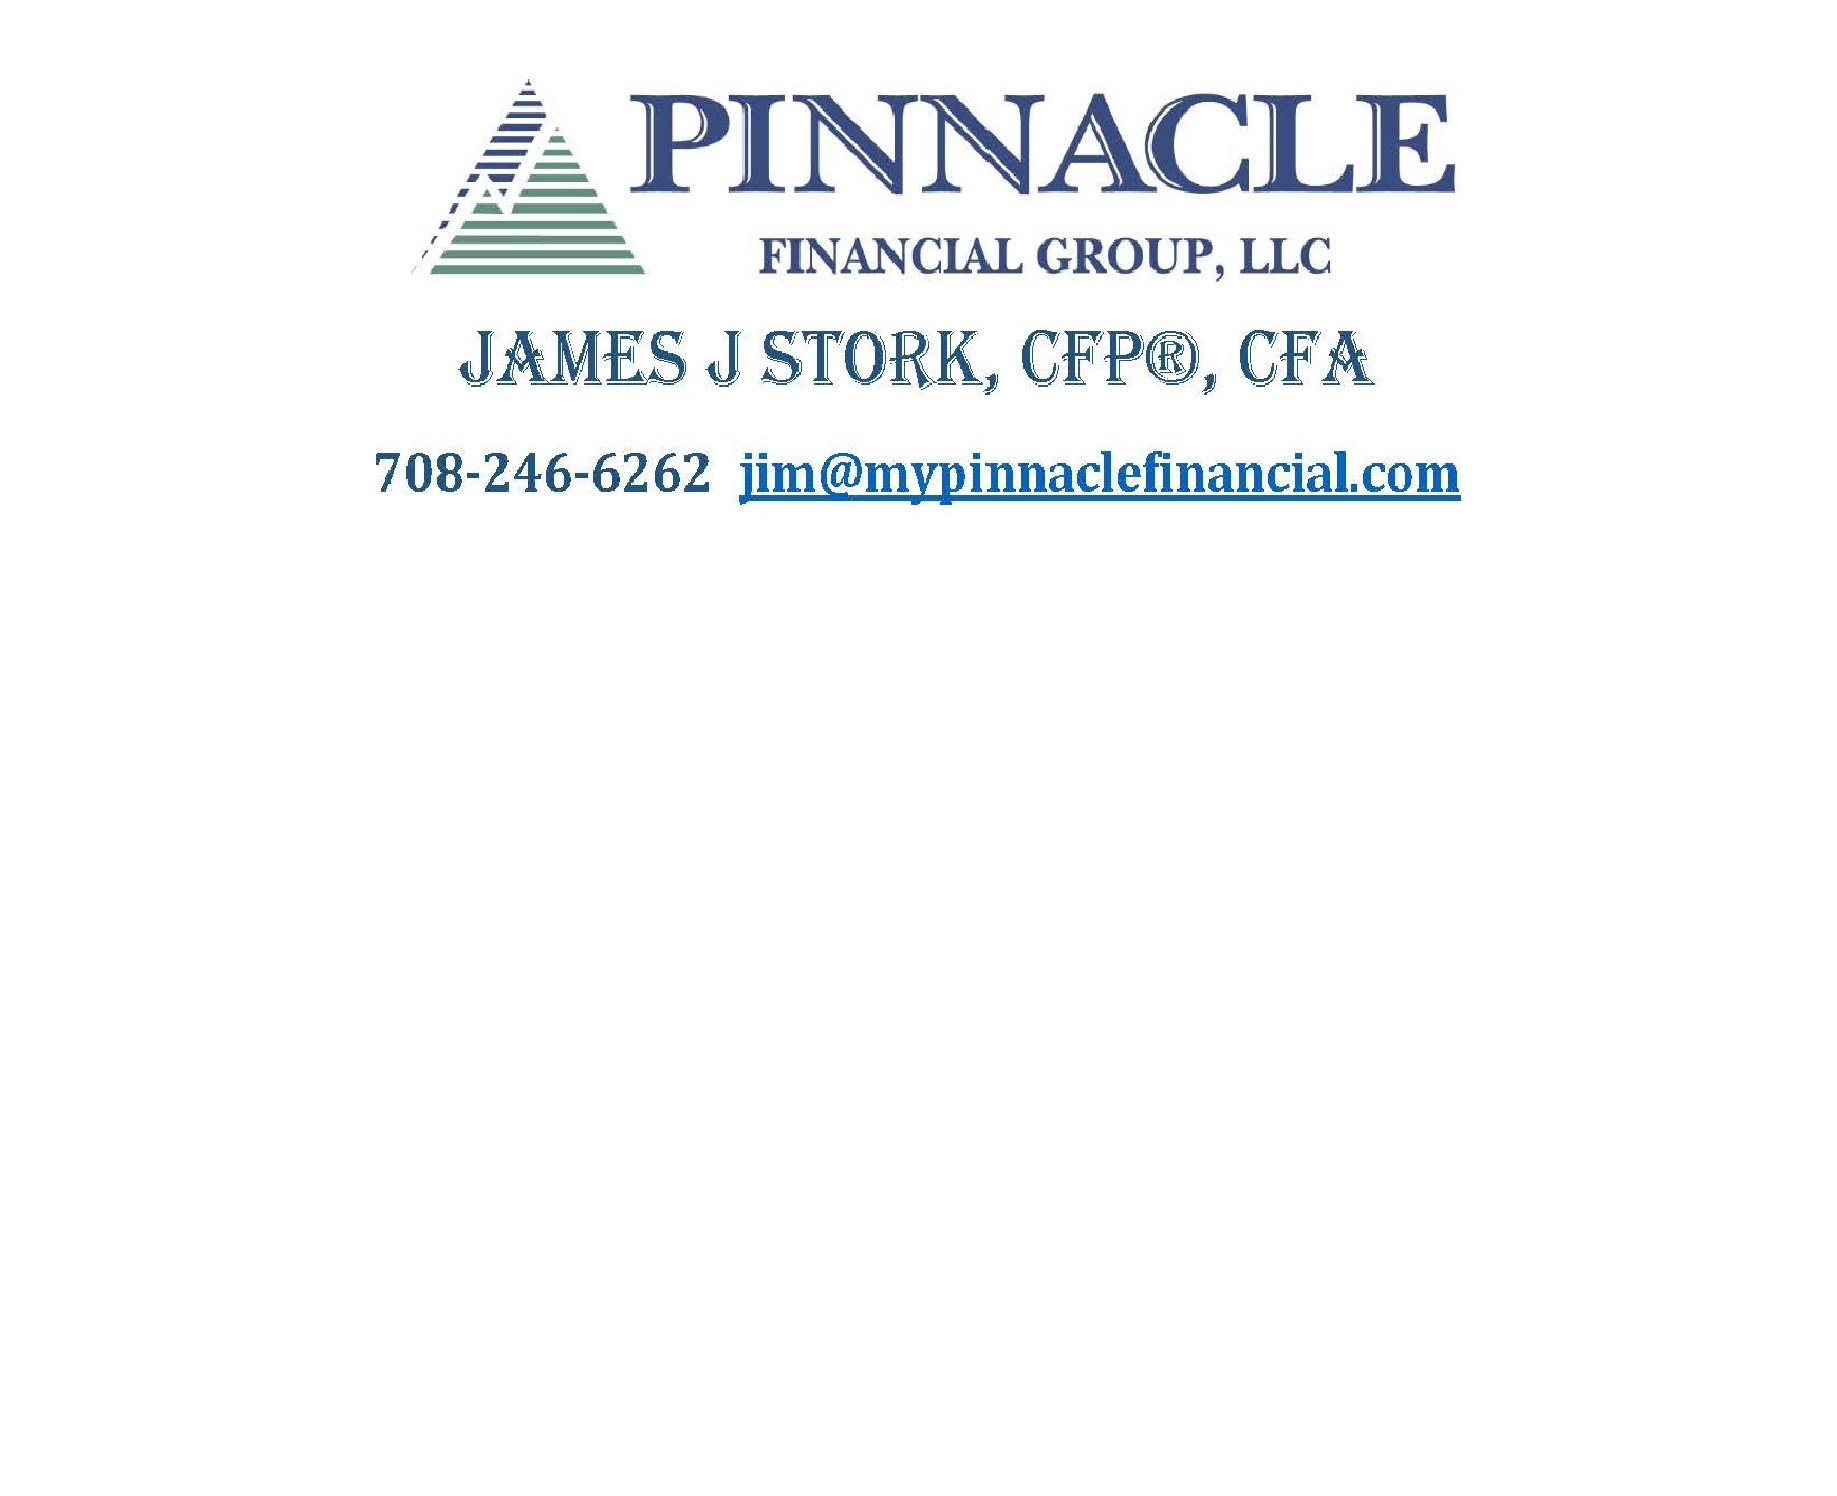 Pinnacle financial group